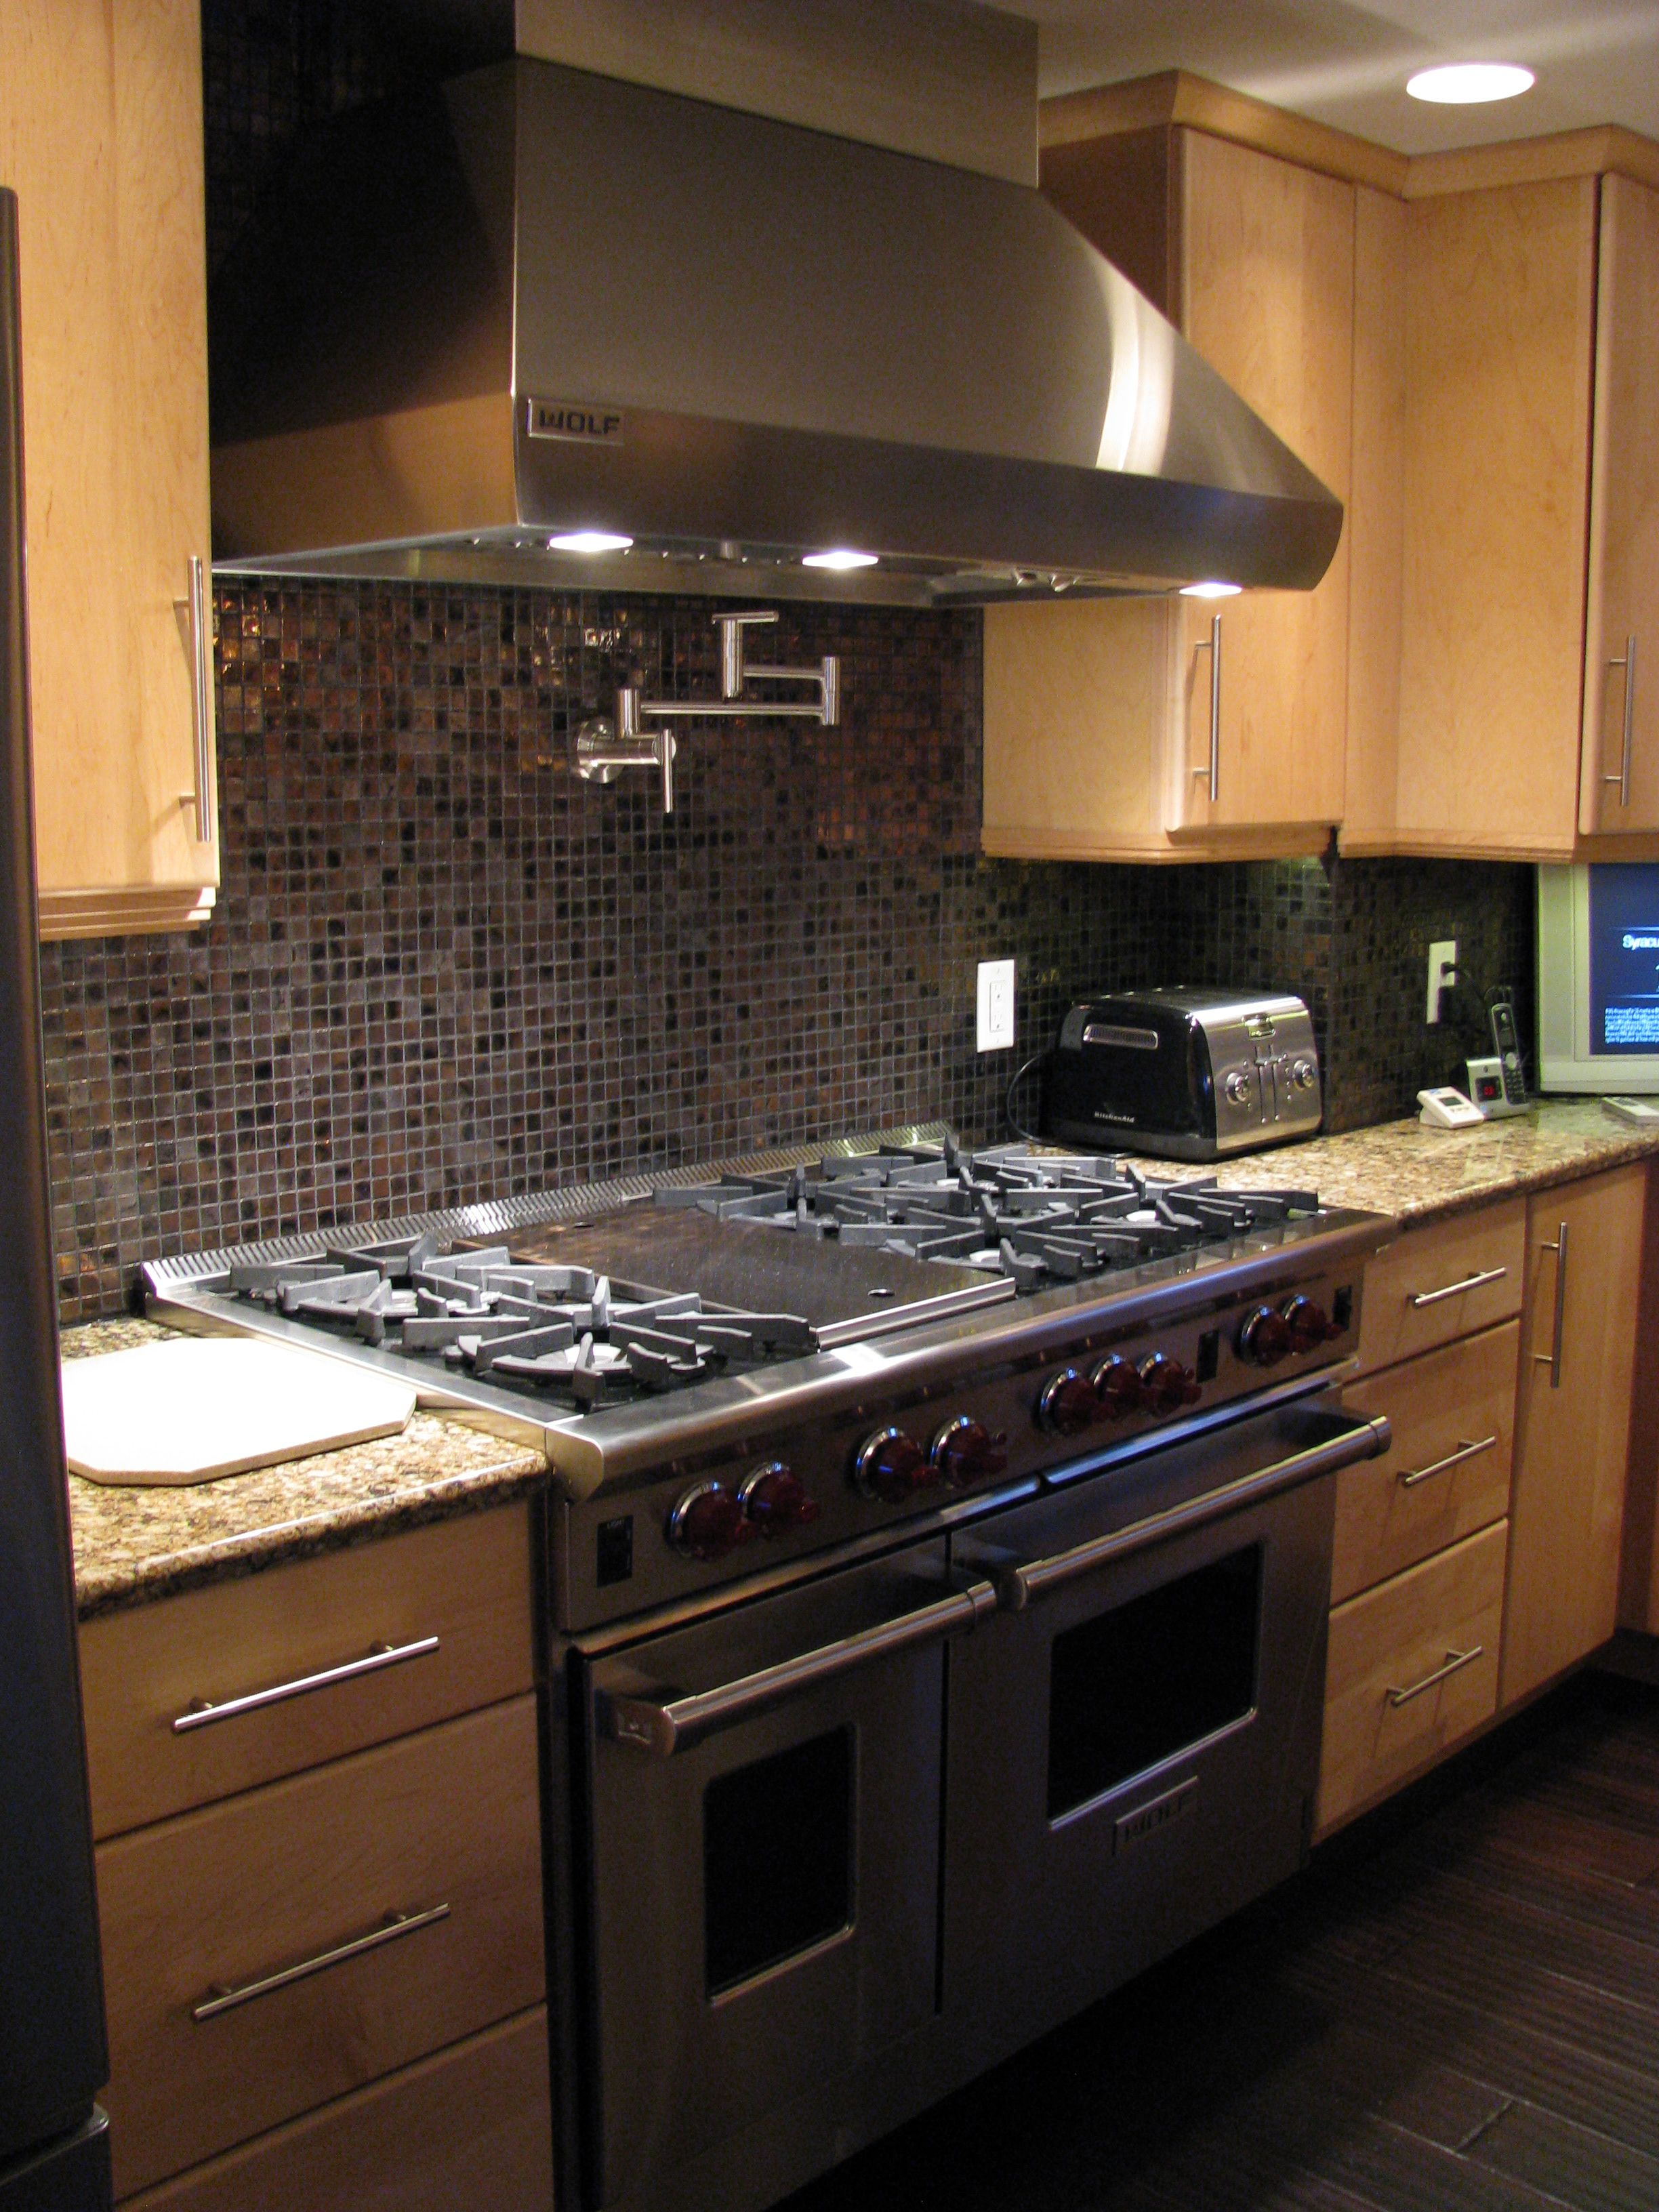 Commercial Kitchen Pot Filler Faucets | Sevenstonesinc.com